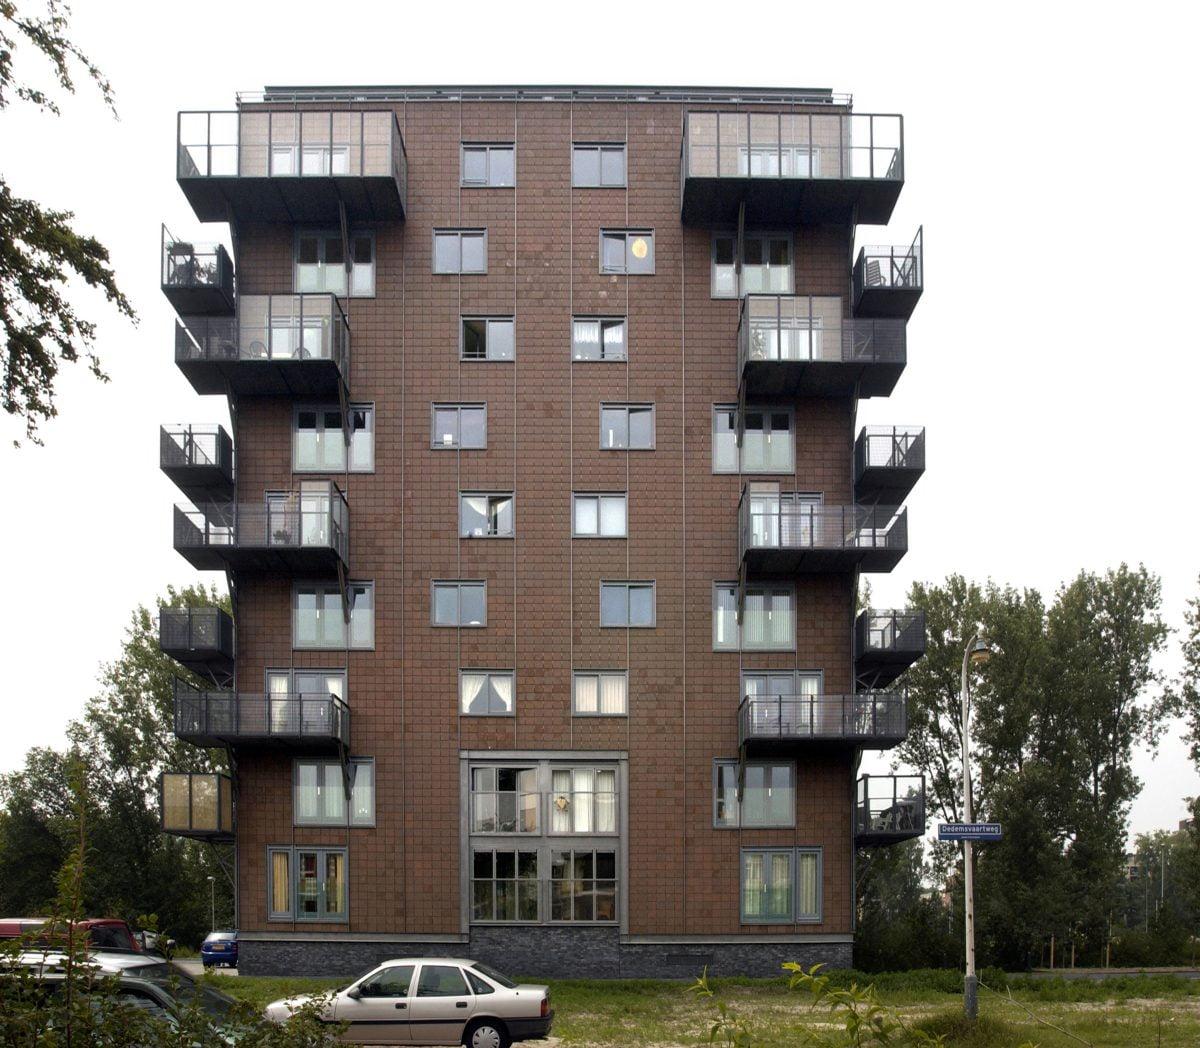 Marlies Rohmer, housing, Dedemsvaartweg, The Hague, Housing Festival, balconies, ceramic facade panels, steel